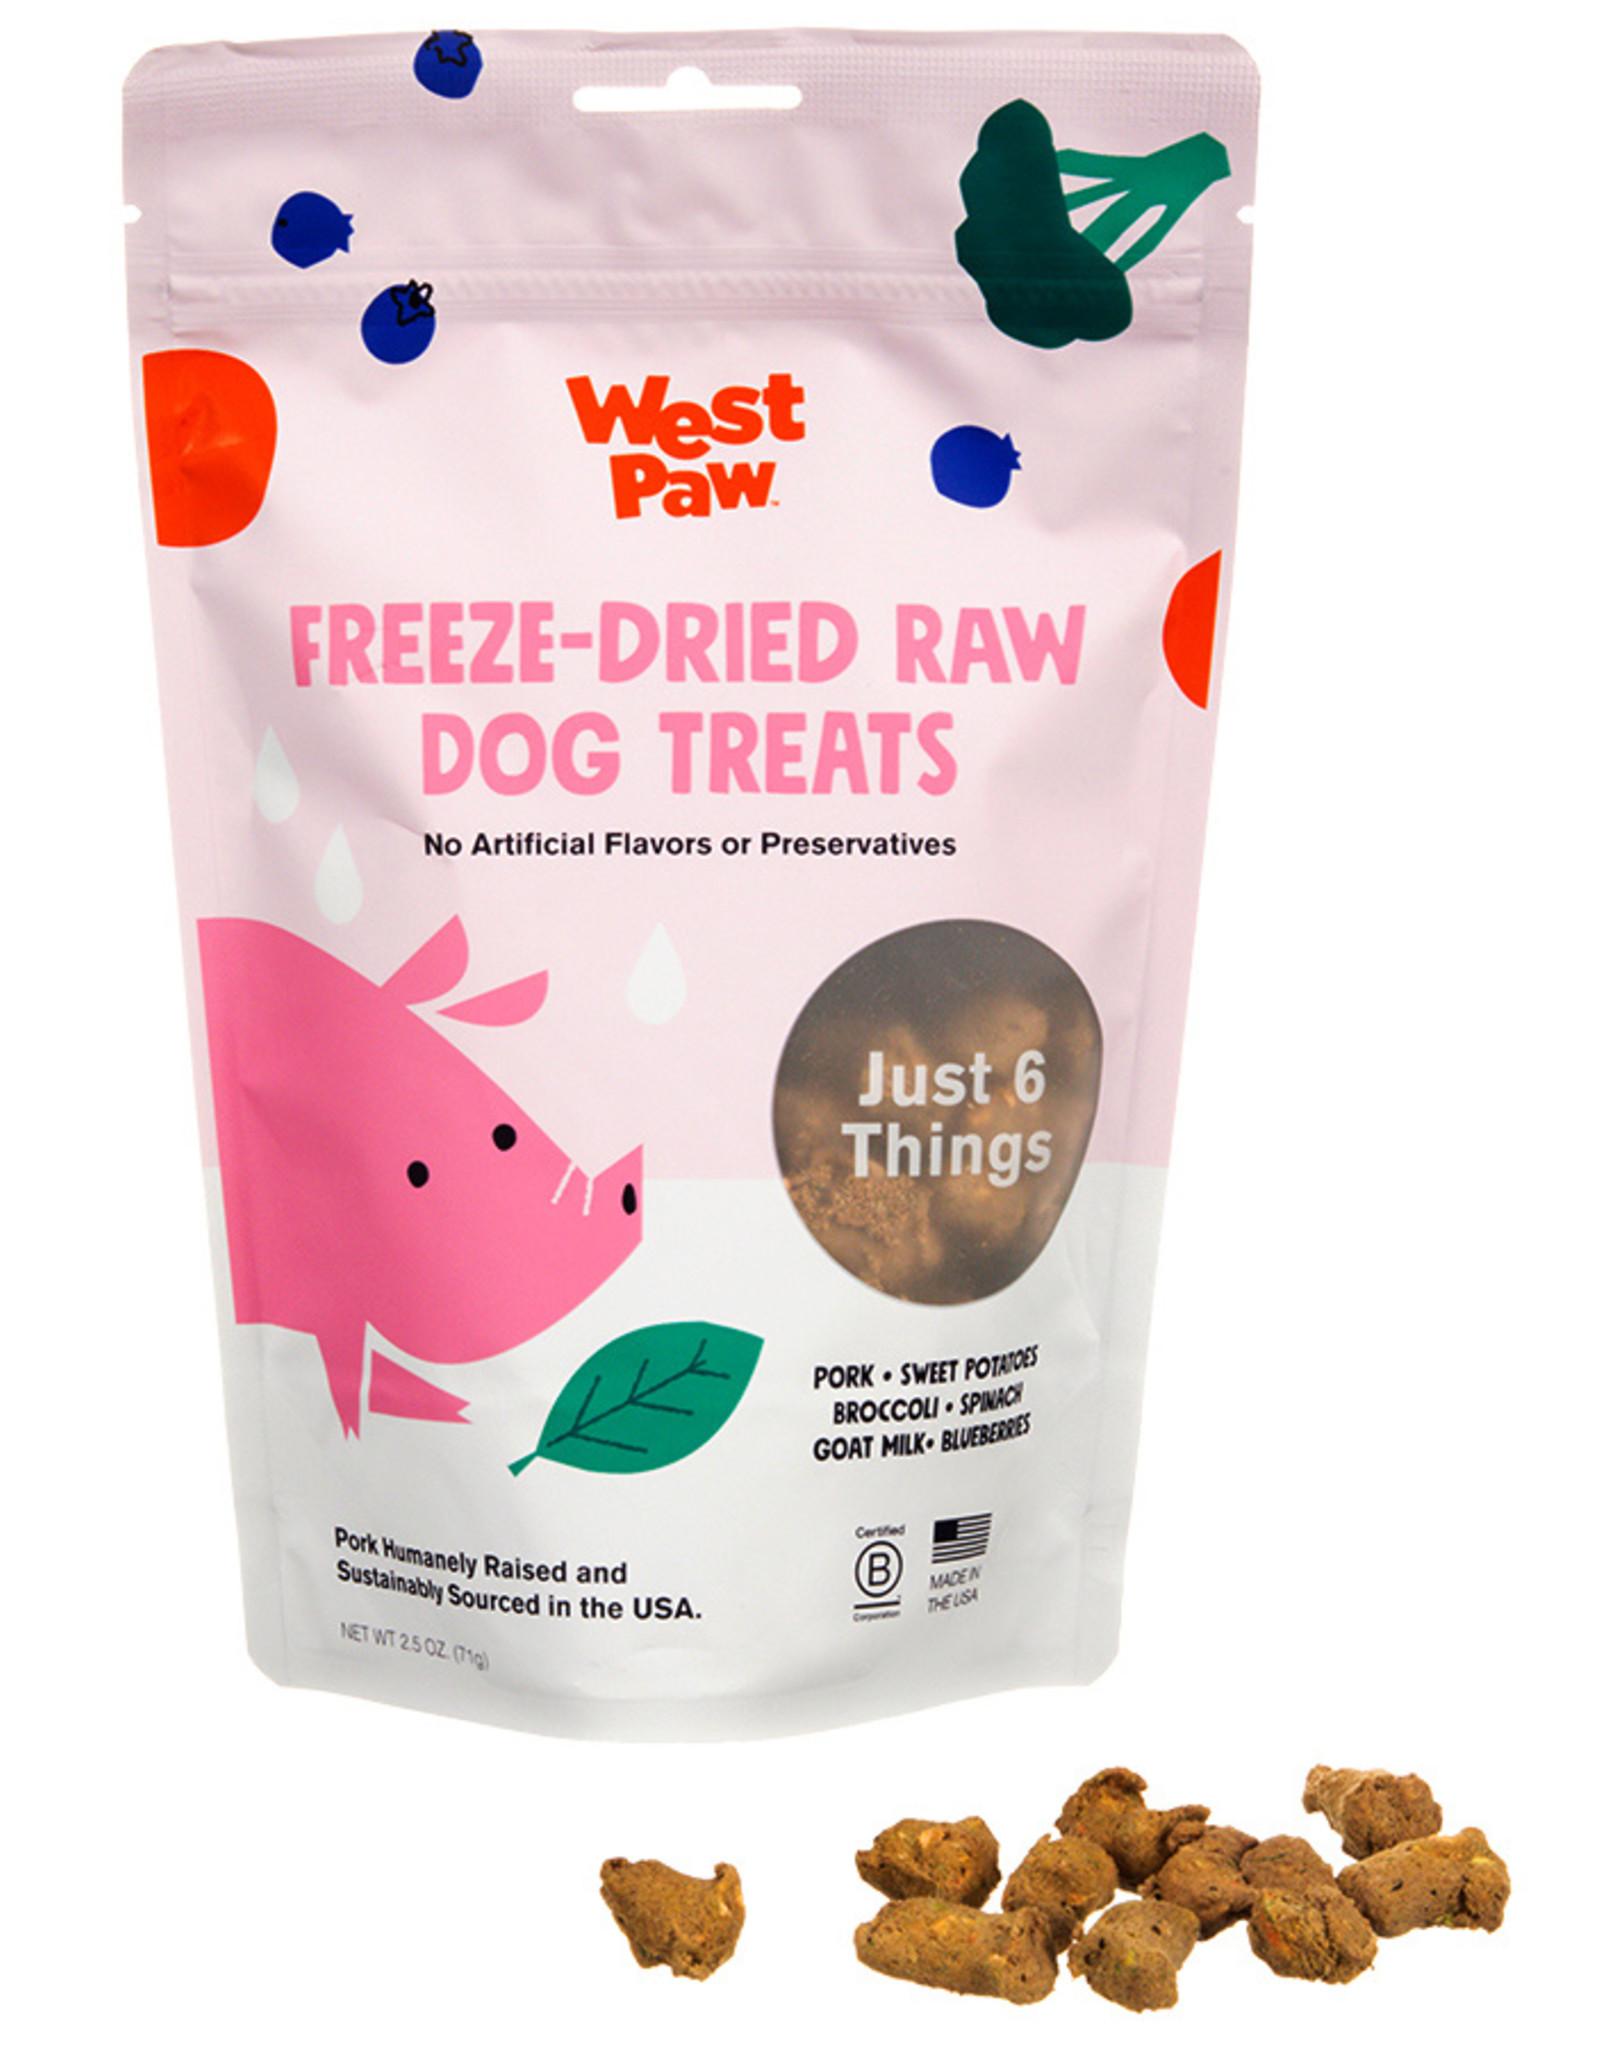 West Paw Pork Superfood Treat